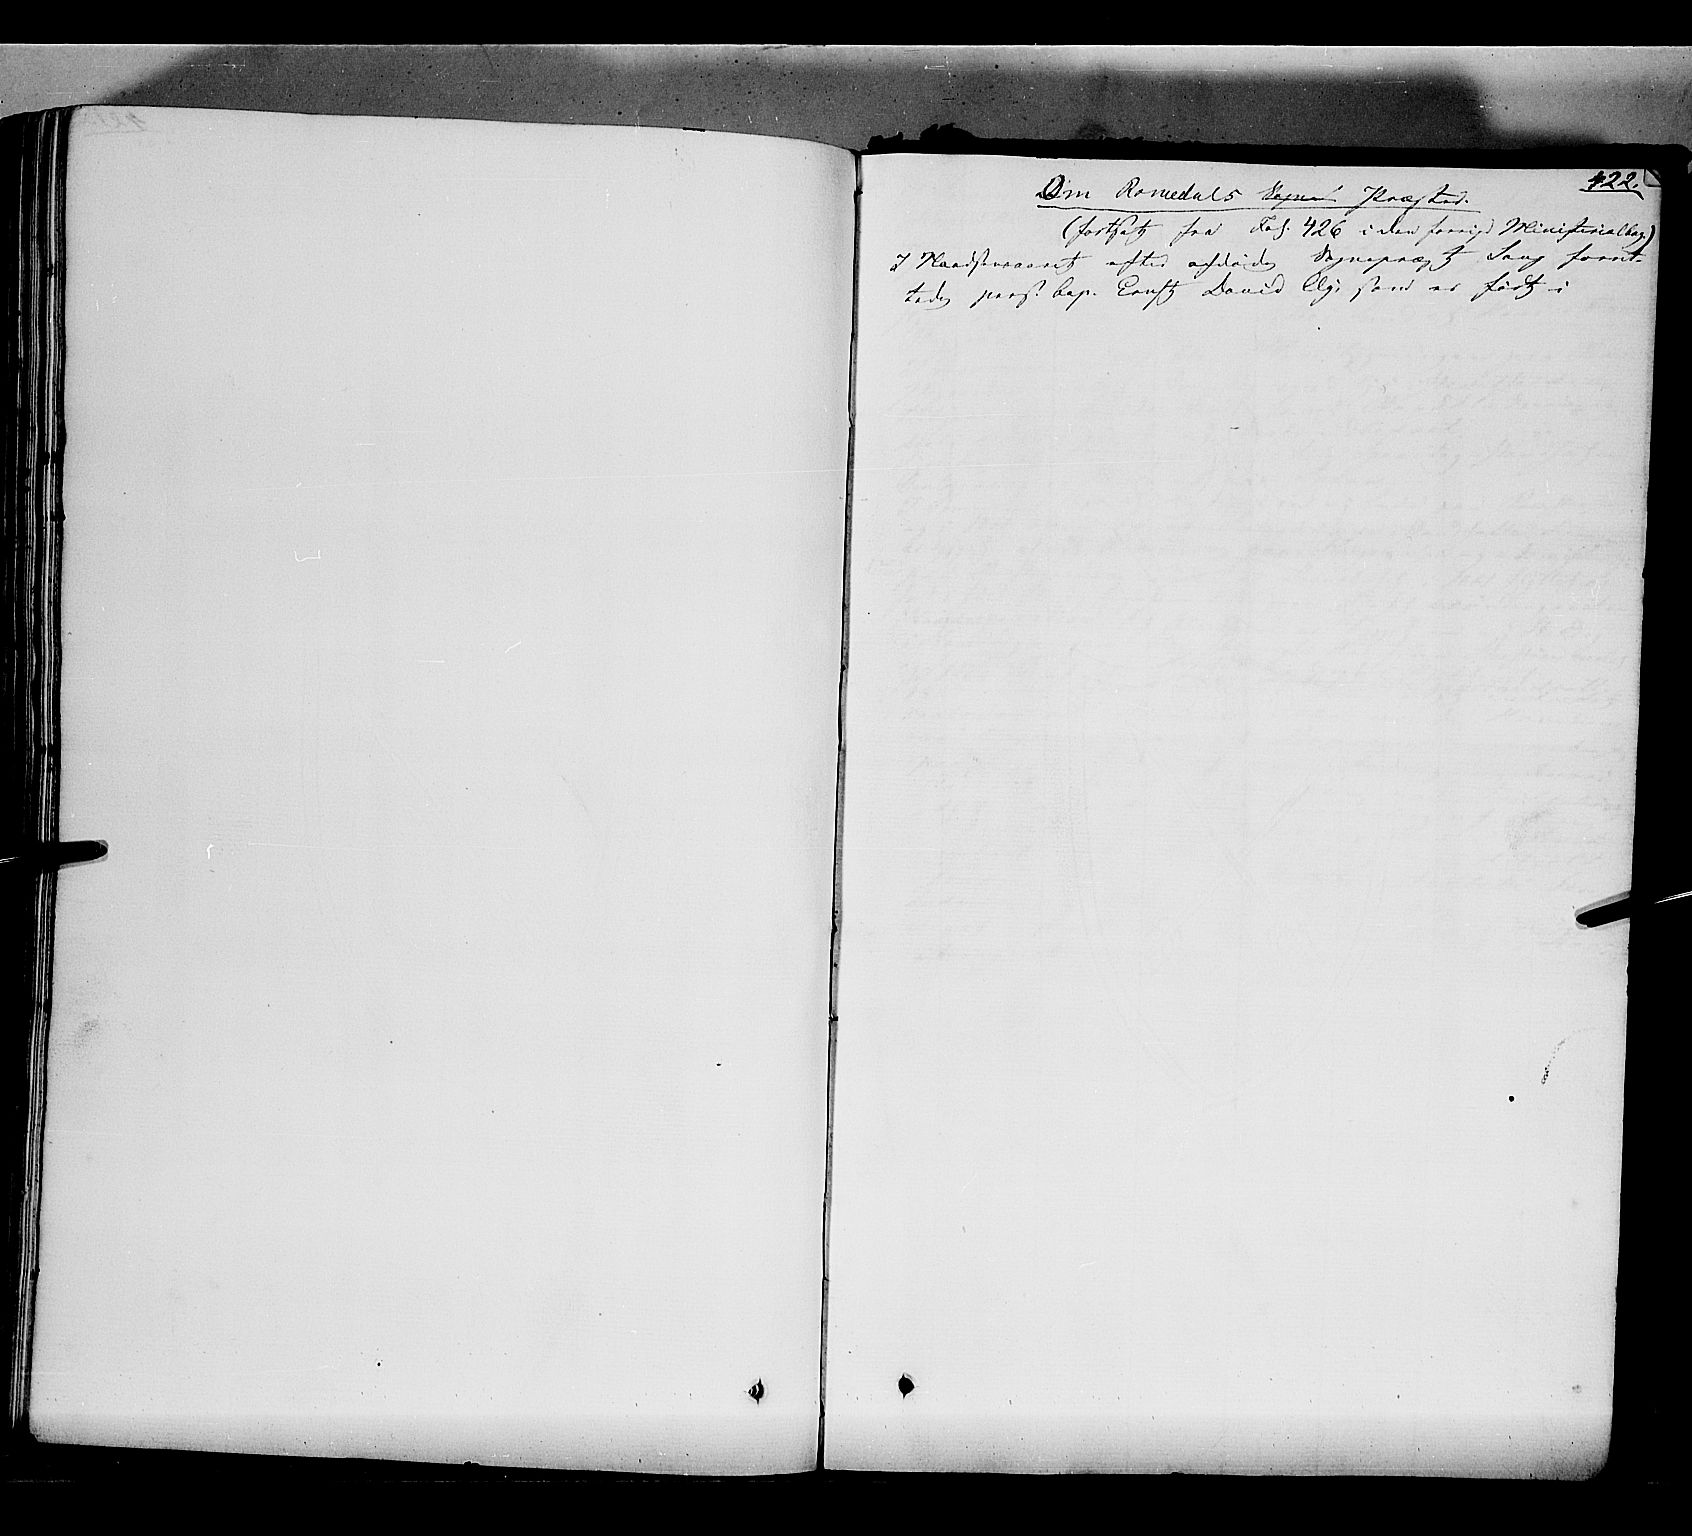 SAH, Romedal prestekontor, K/L0004: Ministerialbok nr. 4, 1847-1861, s. 422